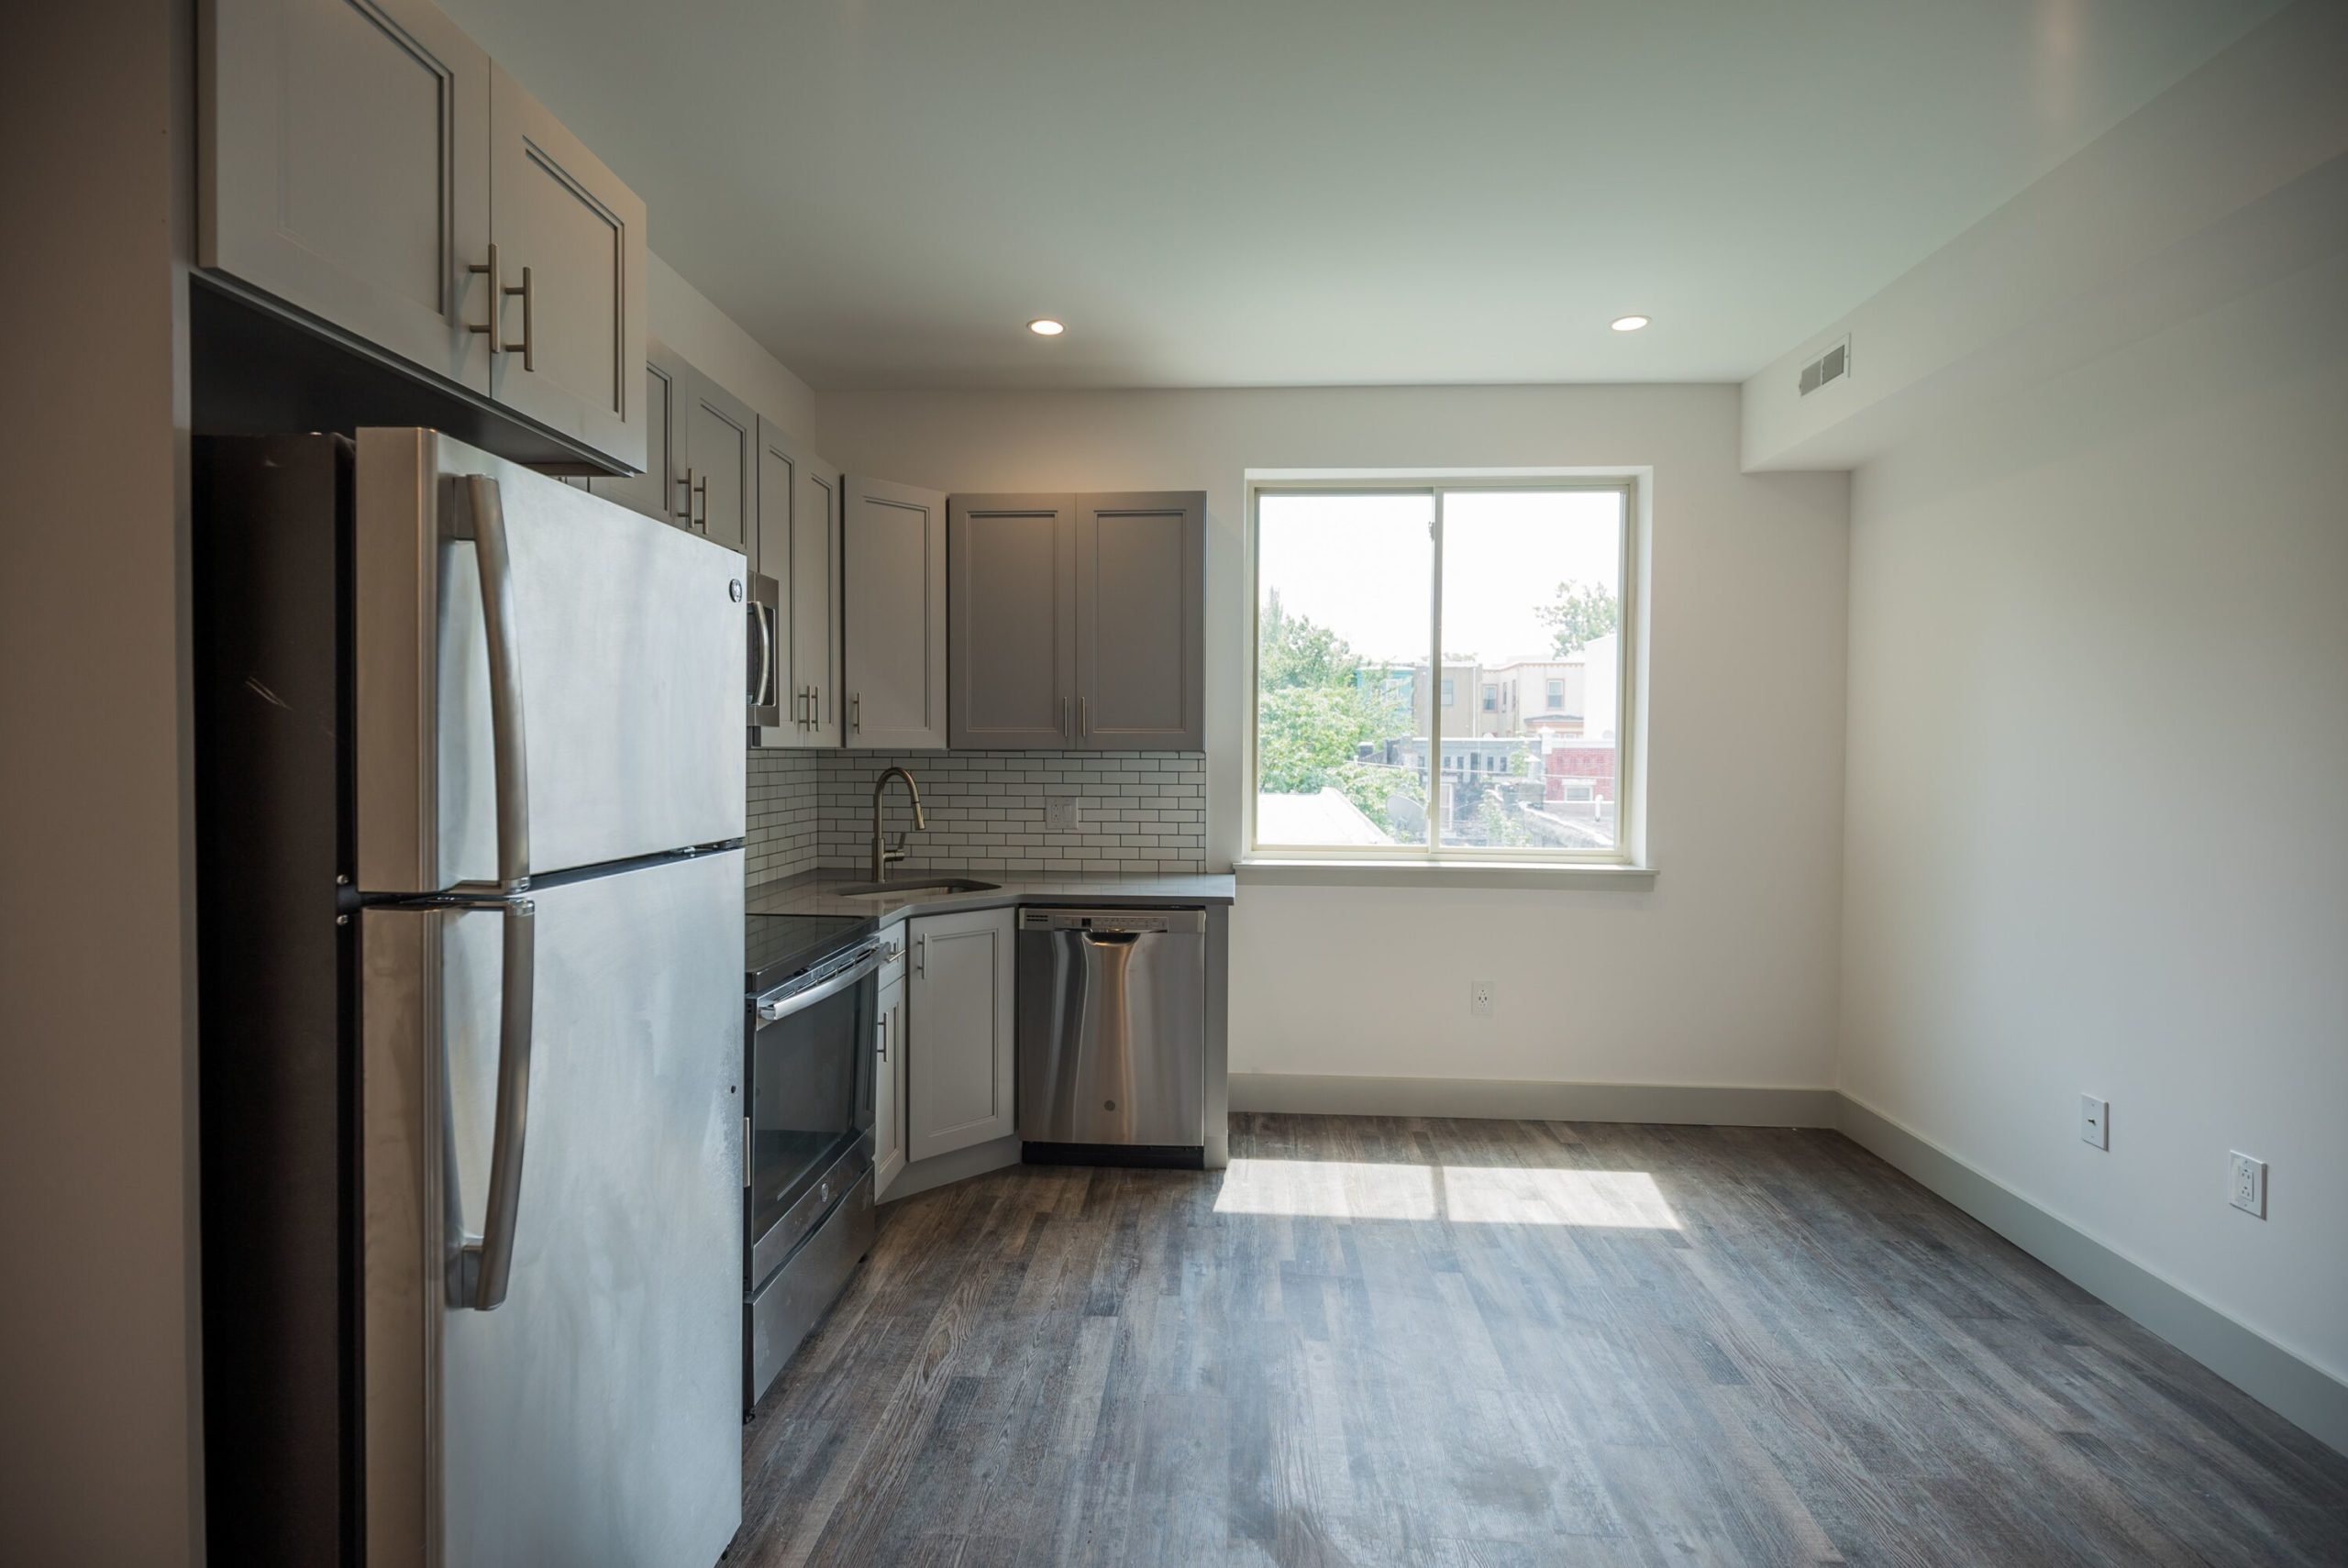 Bedroom With Ensuite Bathroom Male Student 3716 Haverford Avenue Apt 3r S Utilities Included Brandywine Apts